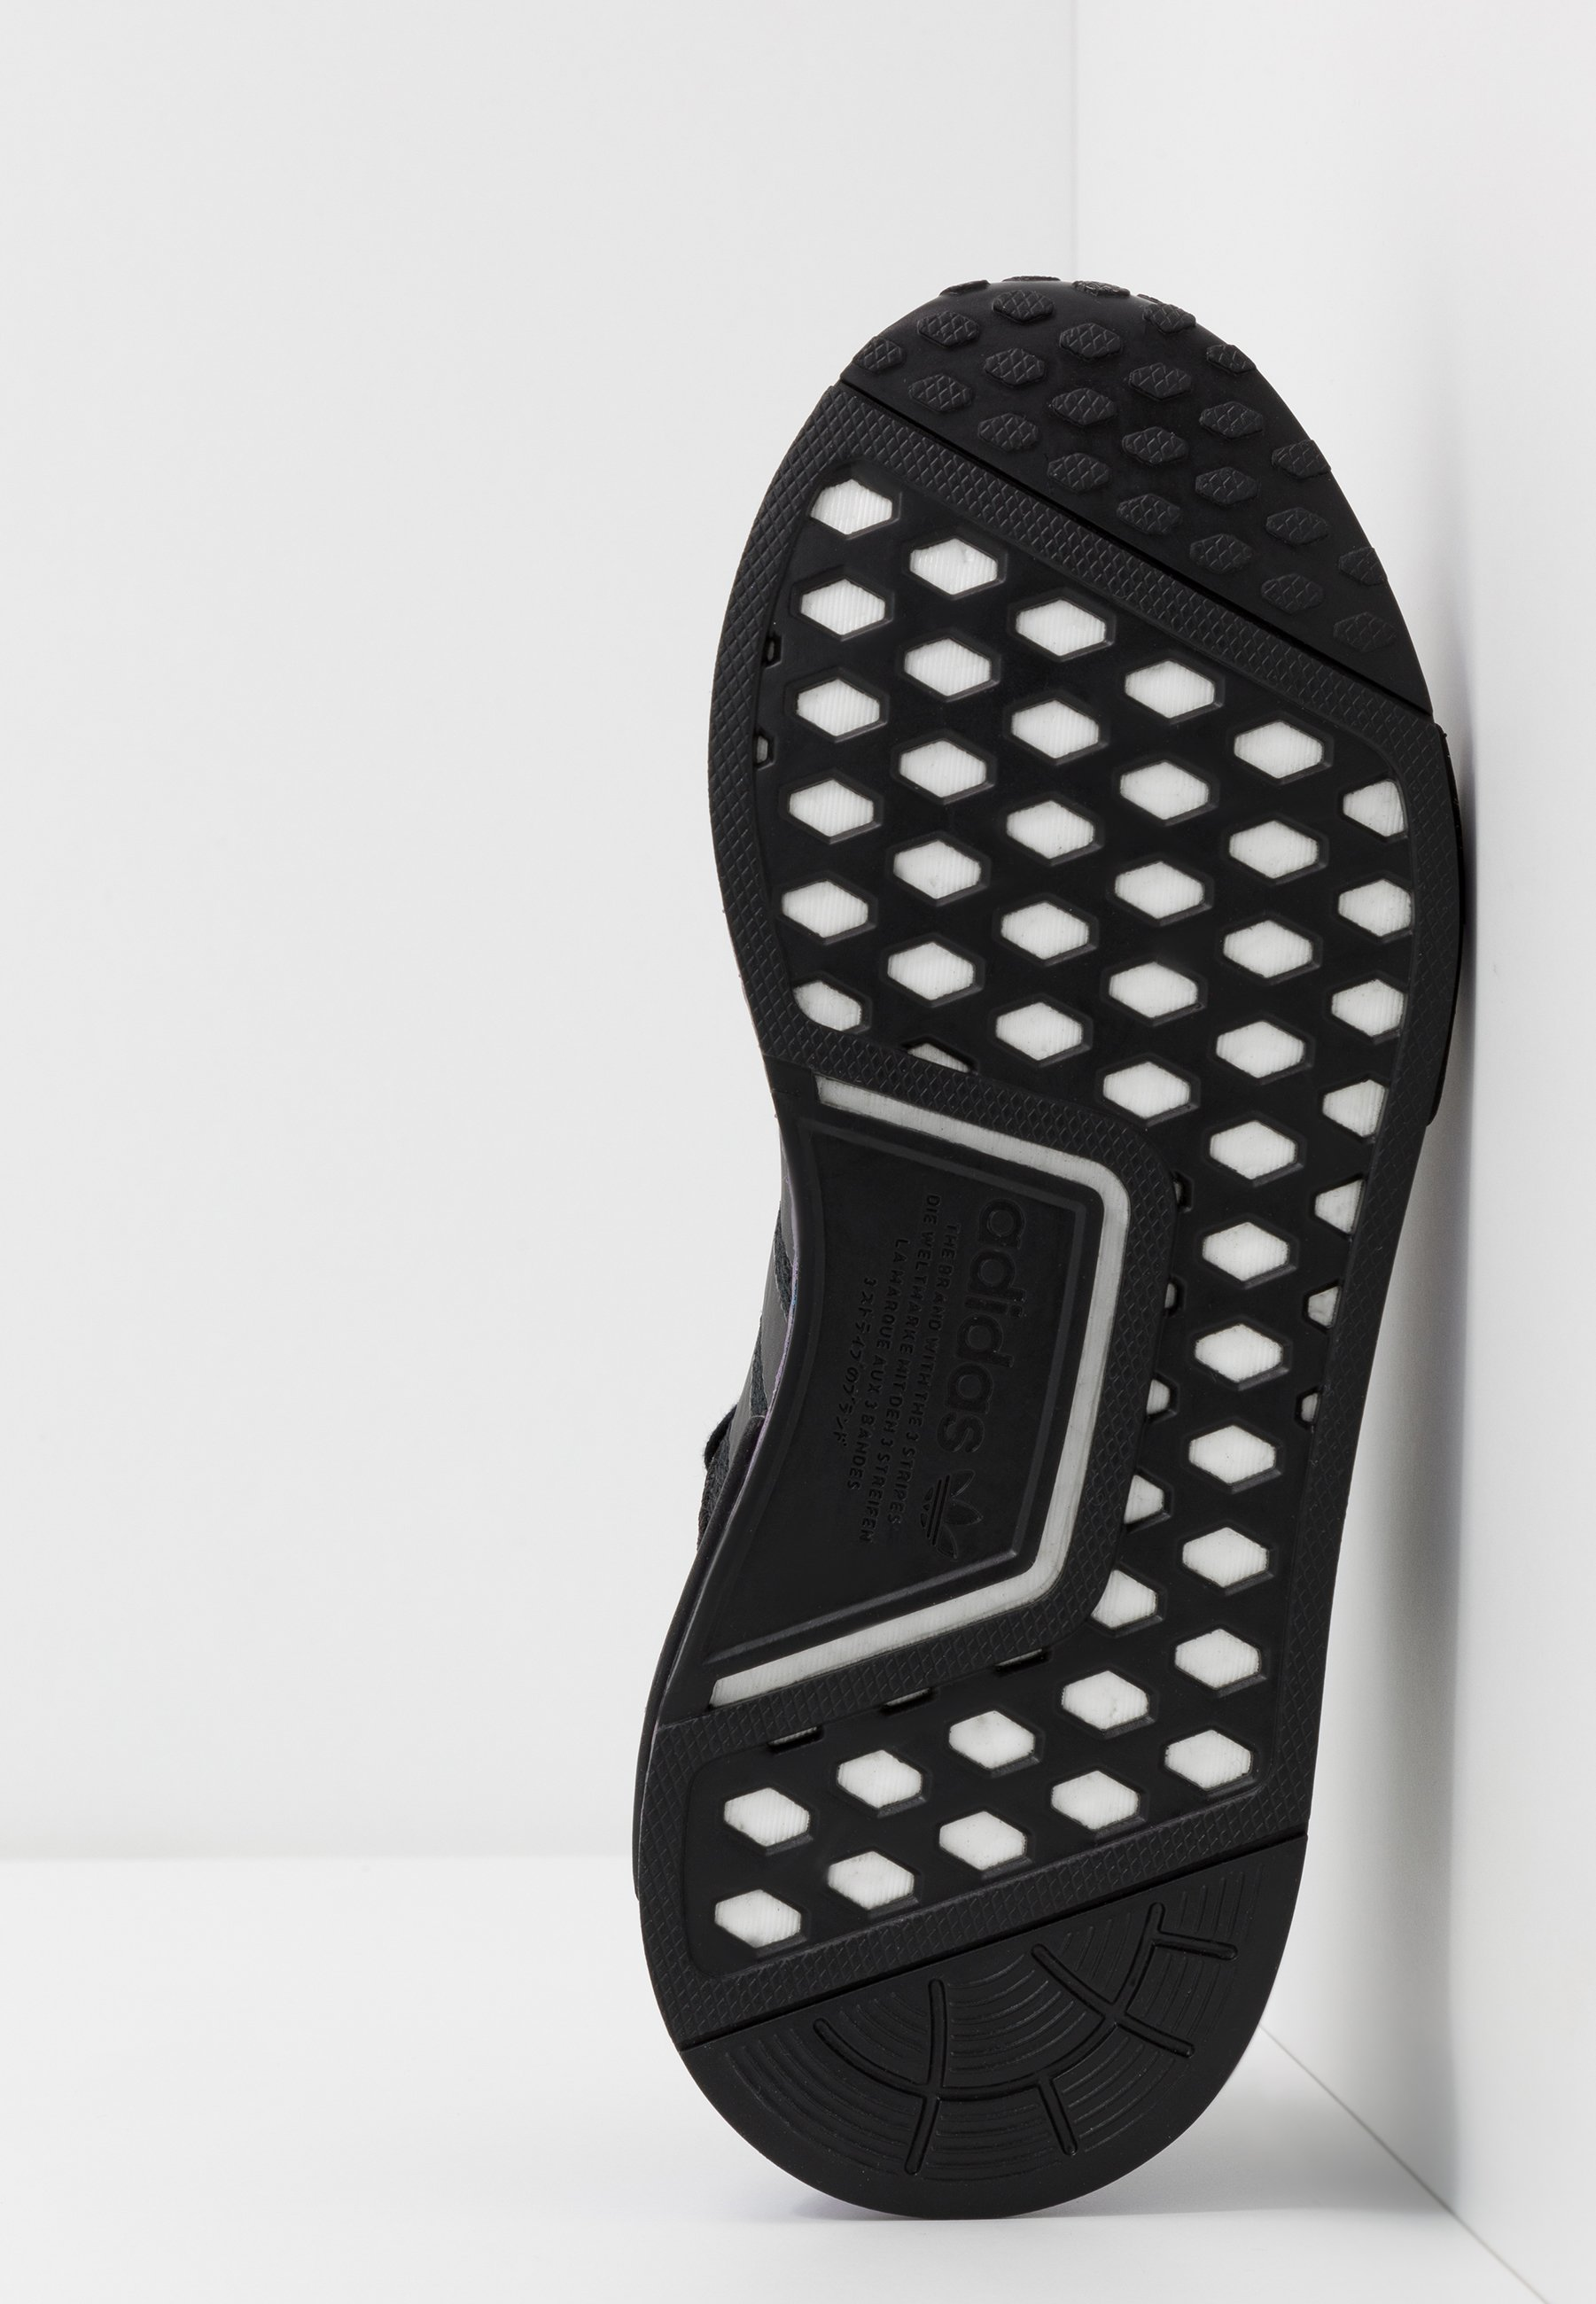 Adidas Originals Nmd_r1 - Sneakers Core Black/carbon